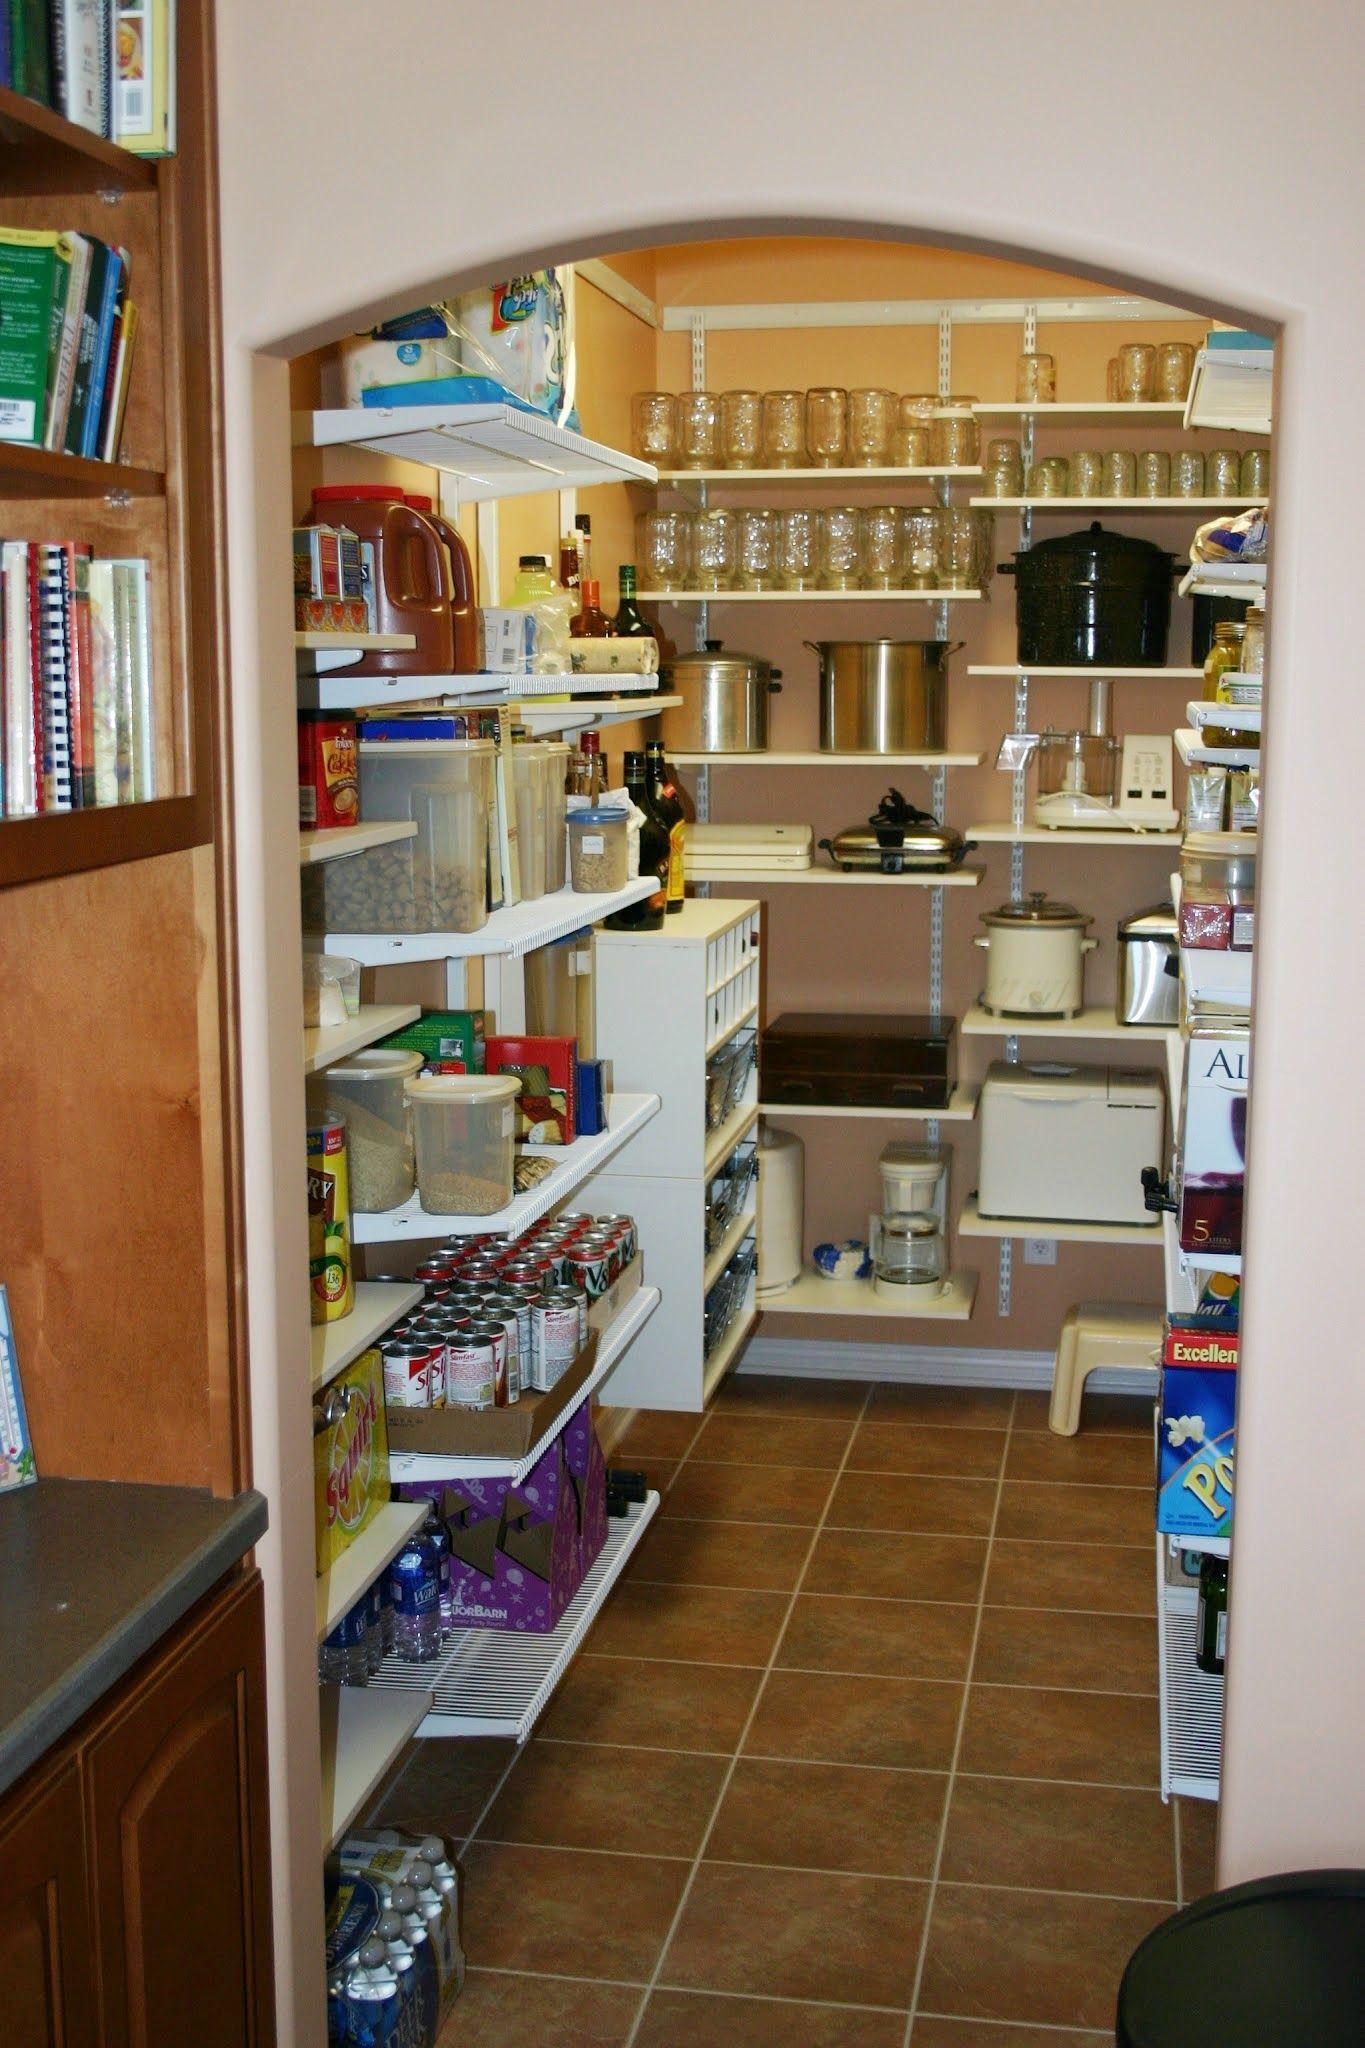 25 Creative Kitchen Pantry Ideas Pantry Design Kitchen Pantry Design Kitchen Pantry Storage